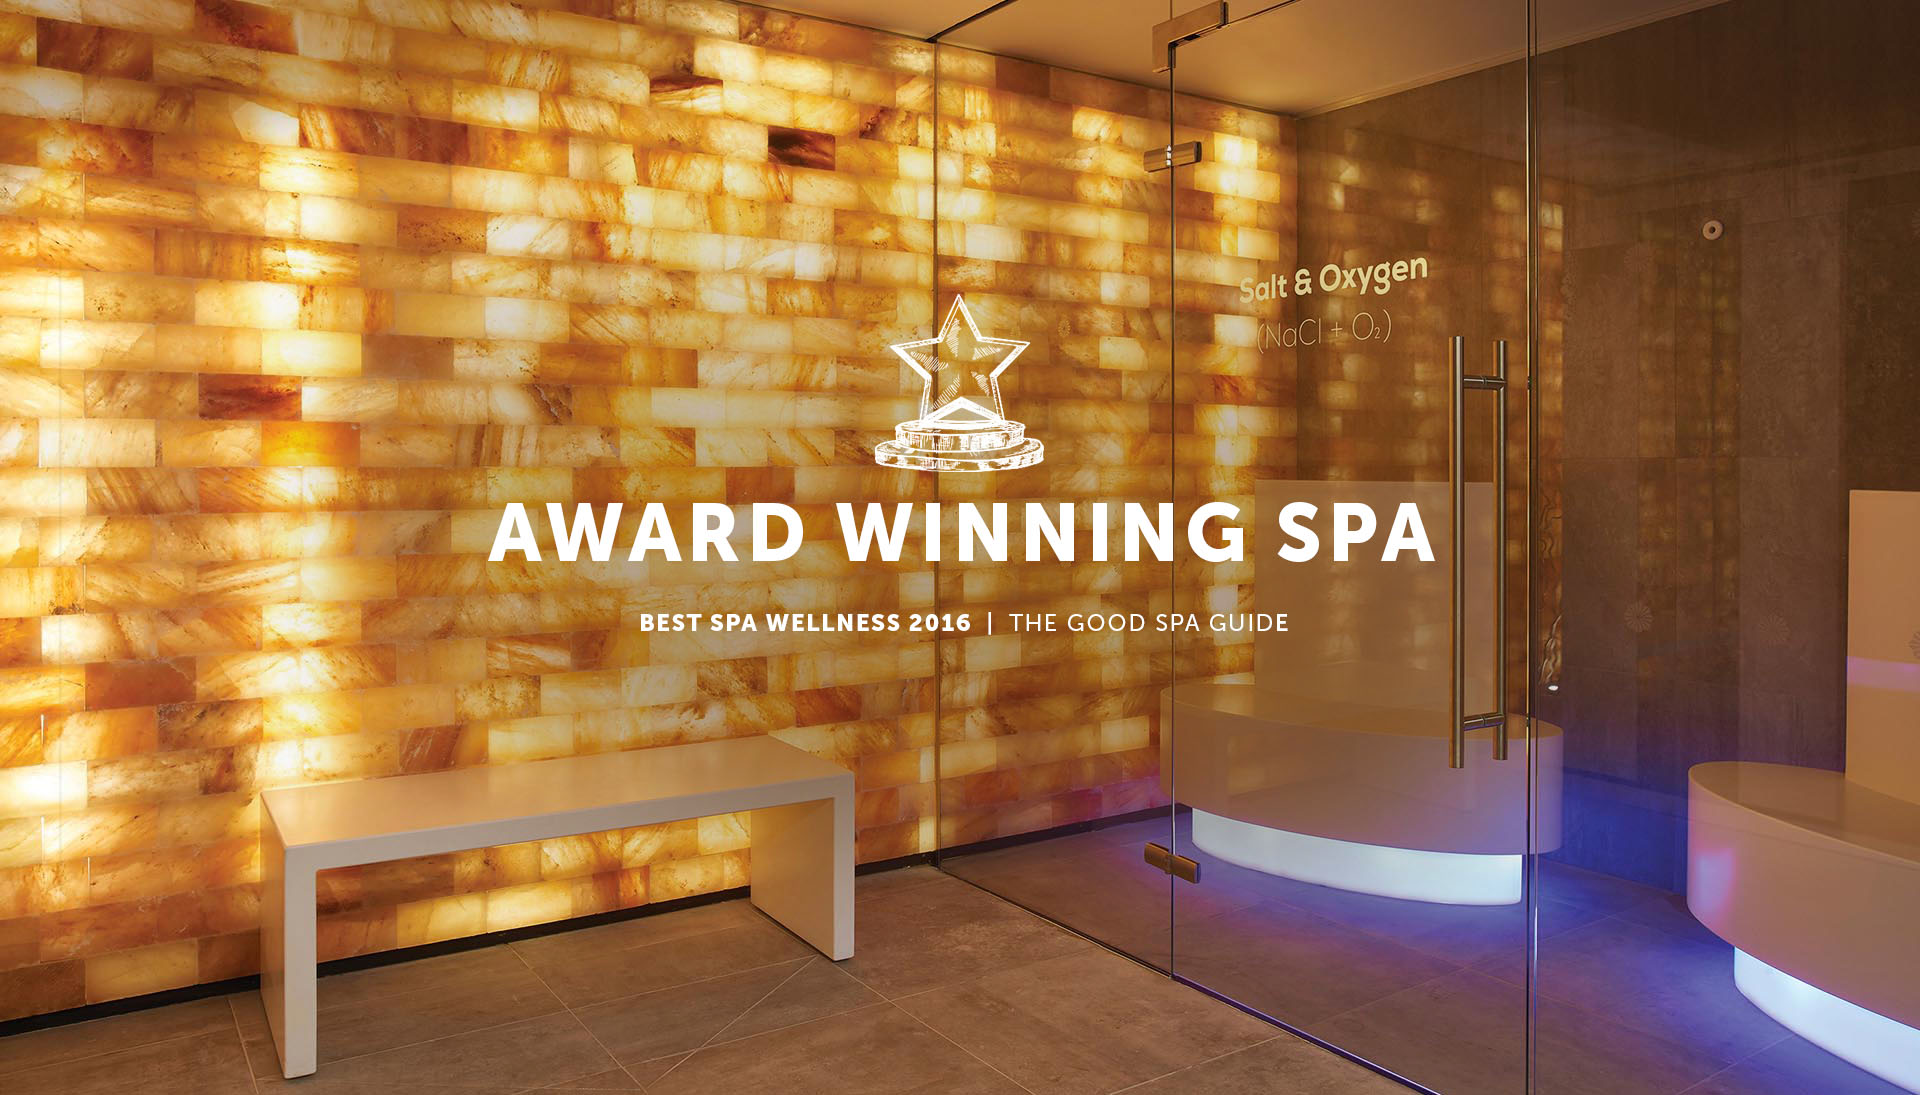 champneys-tring-award-winning-spa-the-good-spa-guide